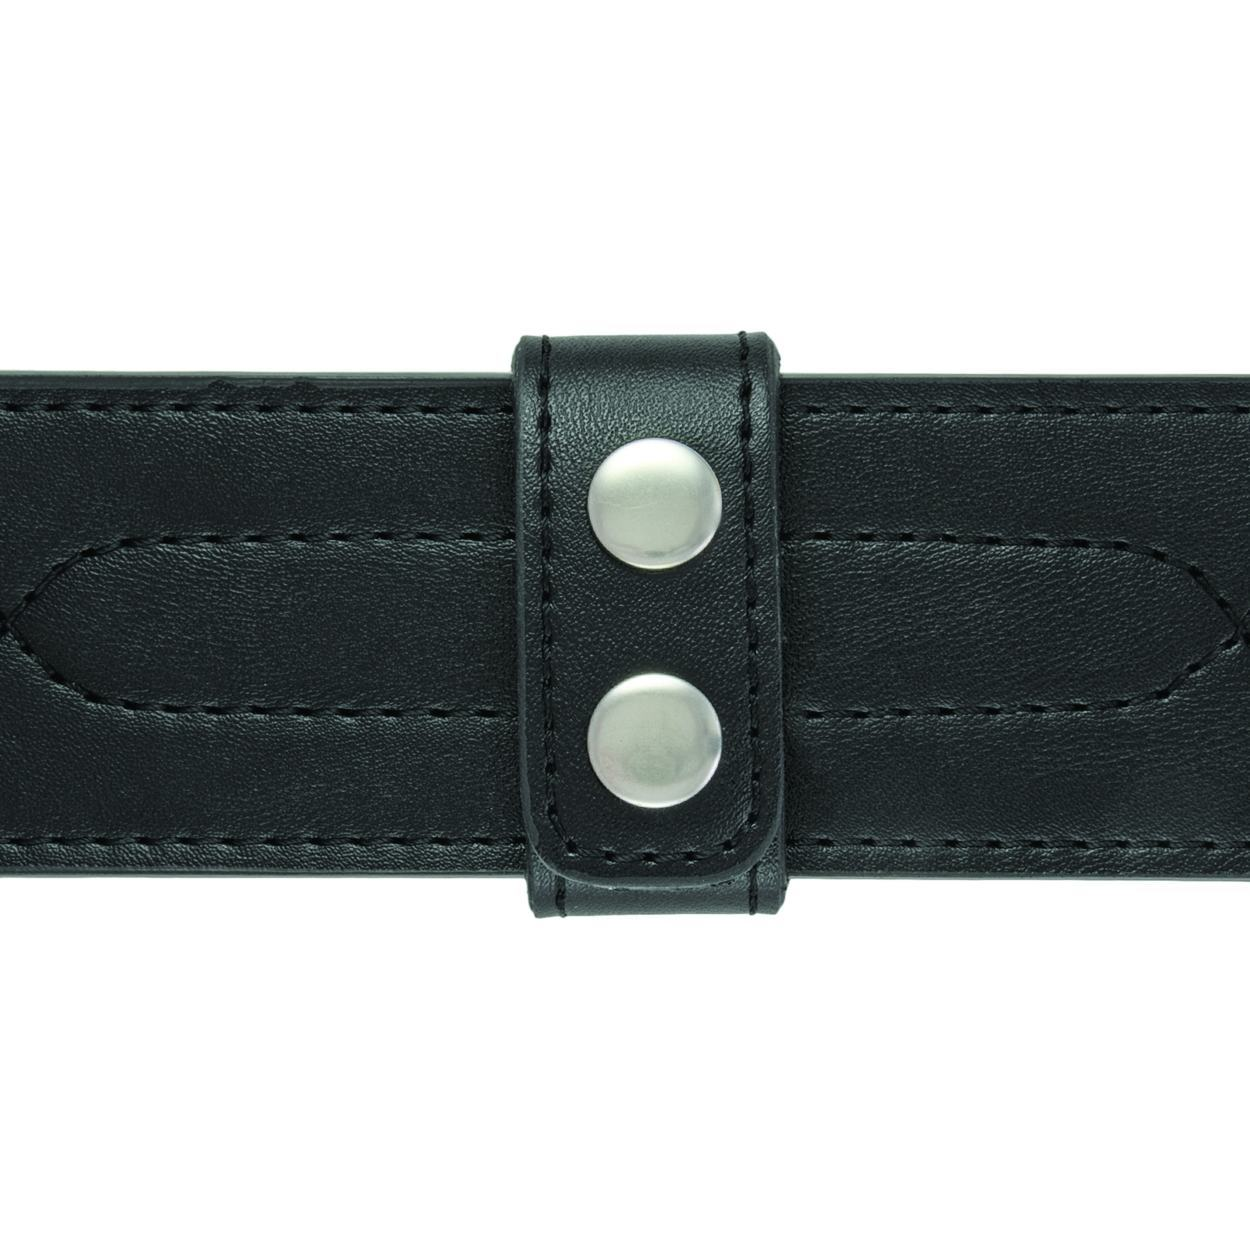 Belt Keepers